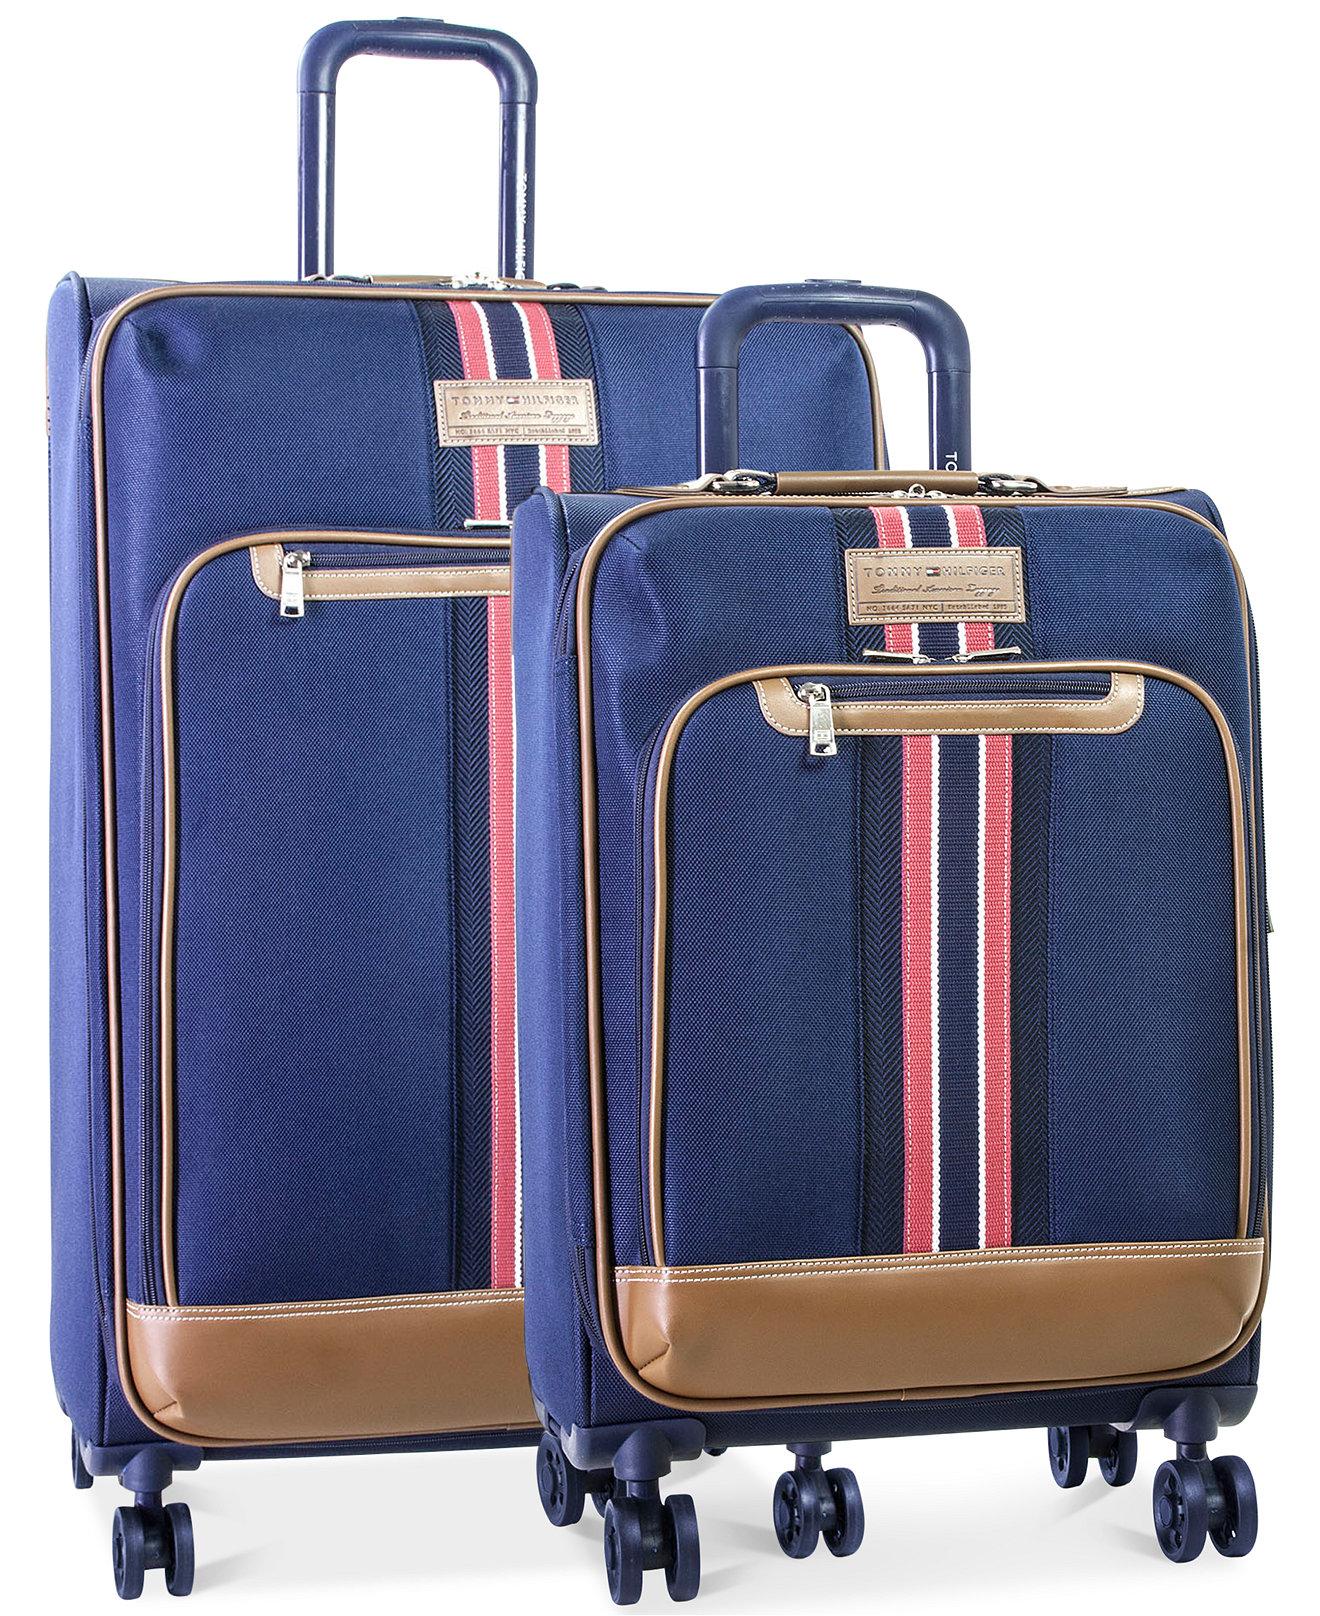 Luggage - Macy's